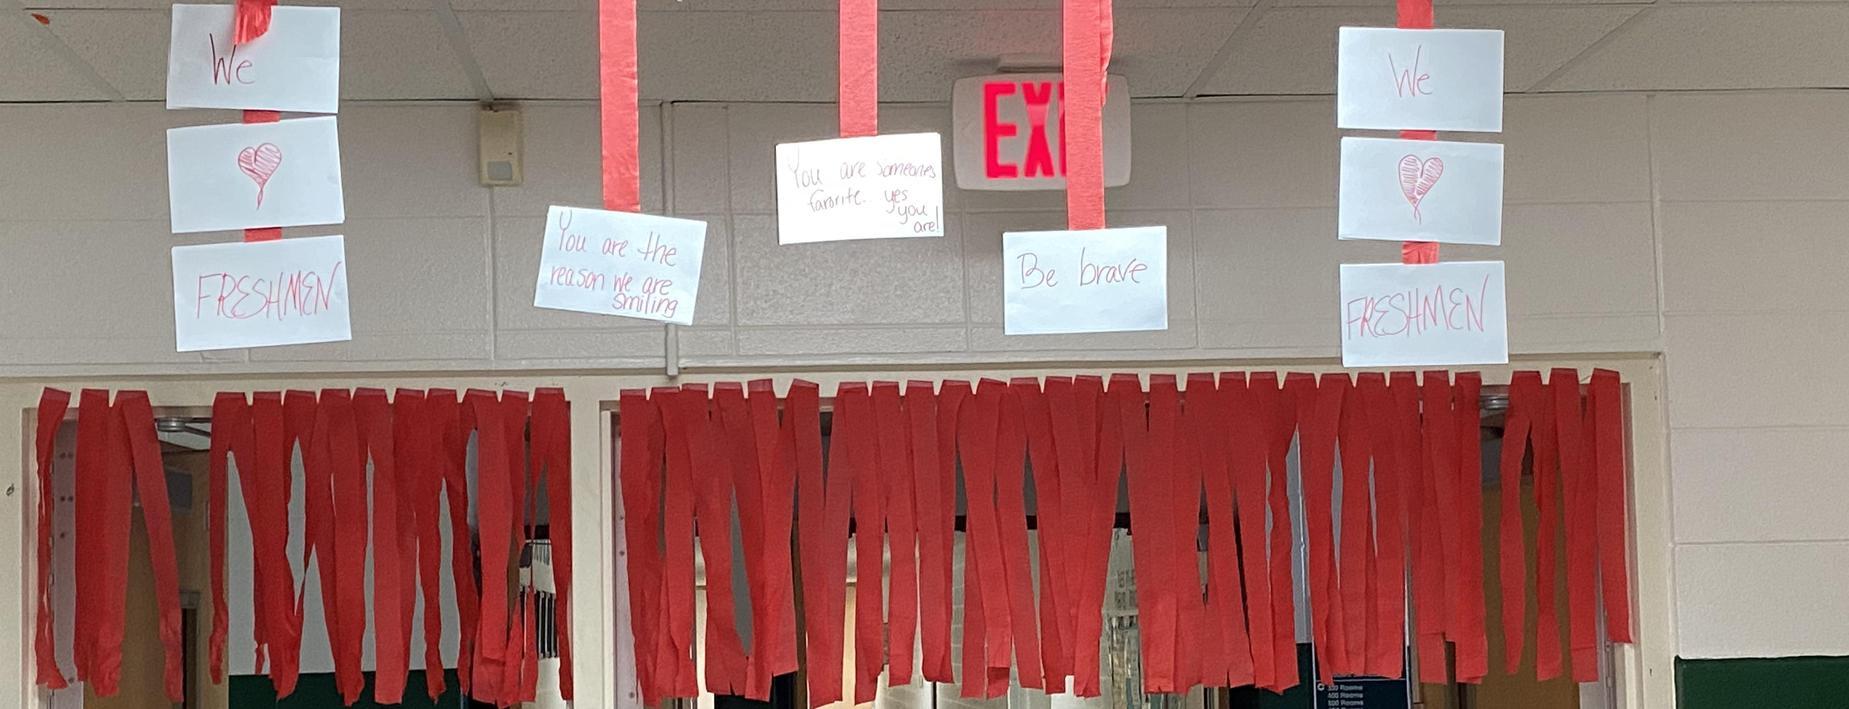 Messages to the freshmen